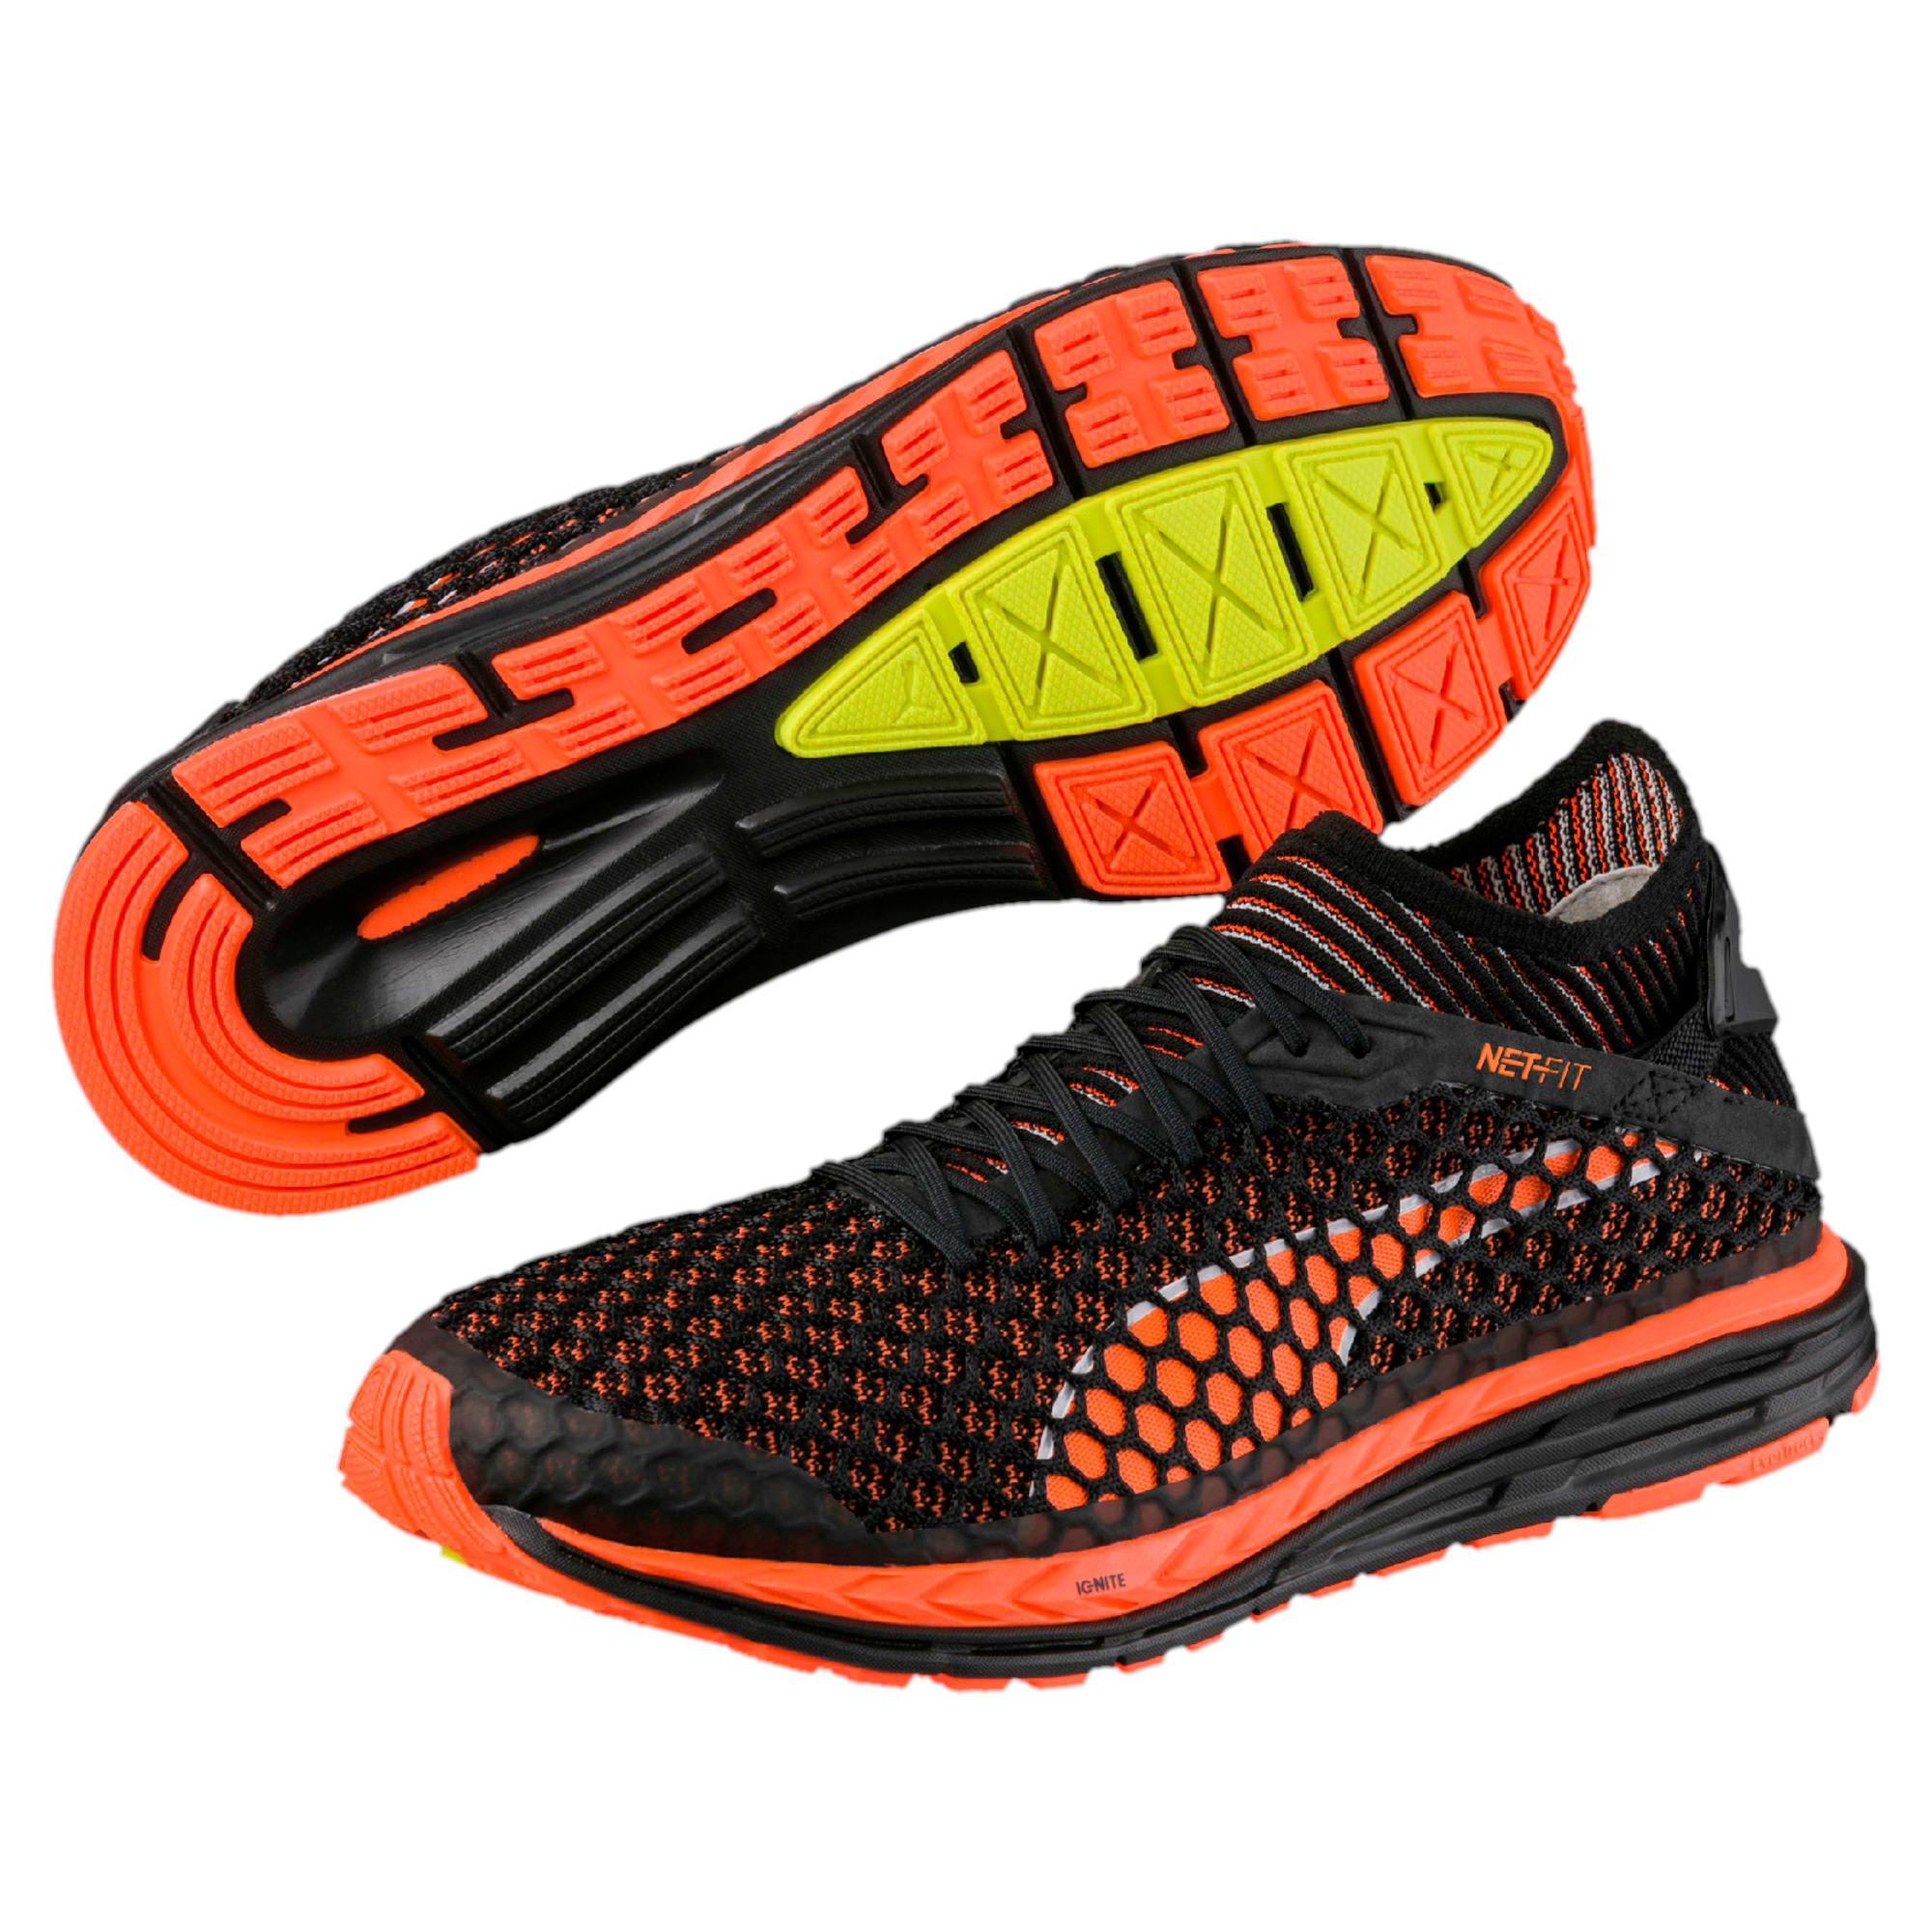 Thumbnail 7 of Speed IGNITE NETFIT Men's Running Shoes, Black-Shocking Orange-White, medium-IND